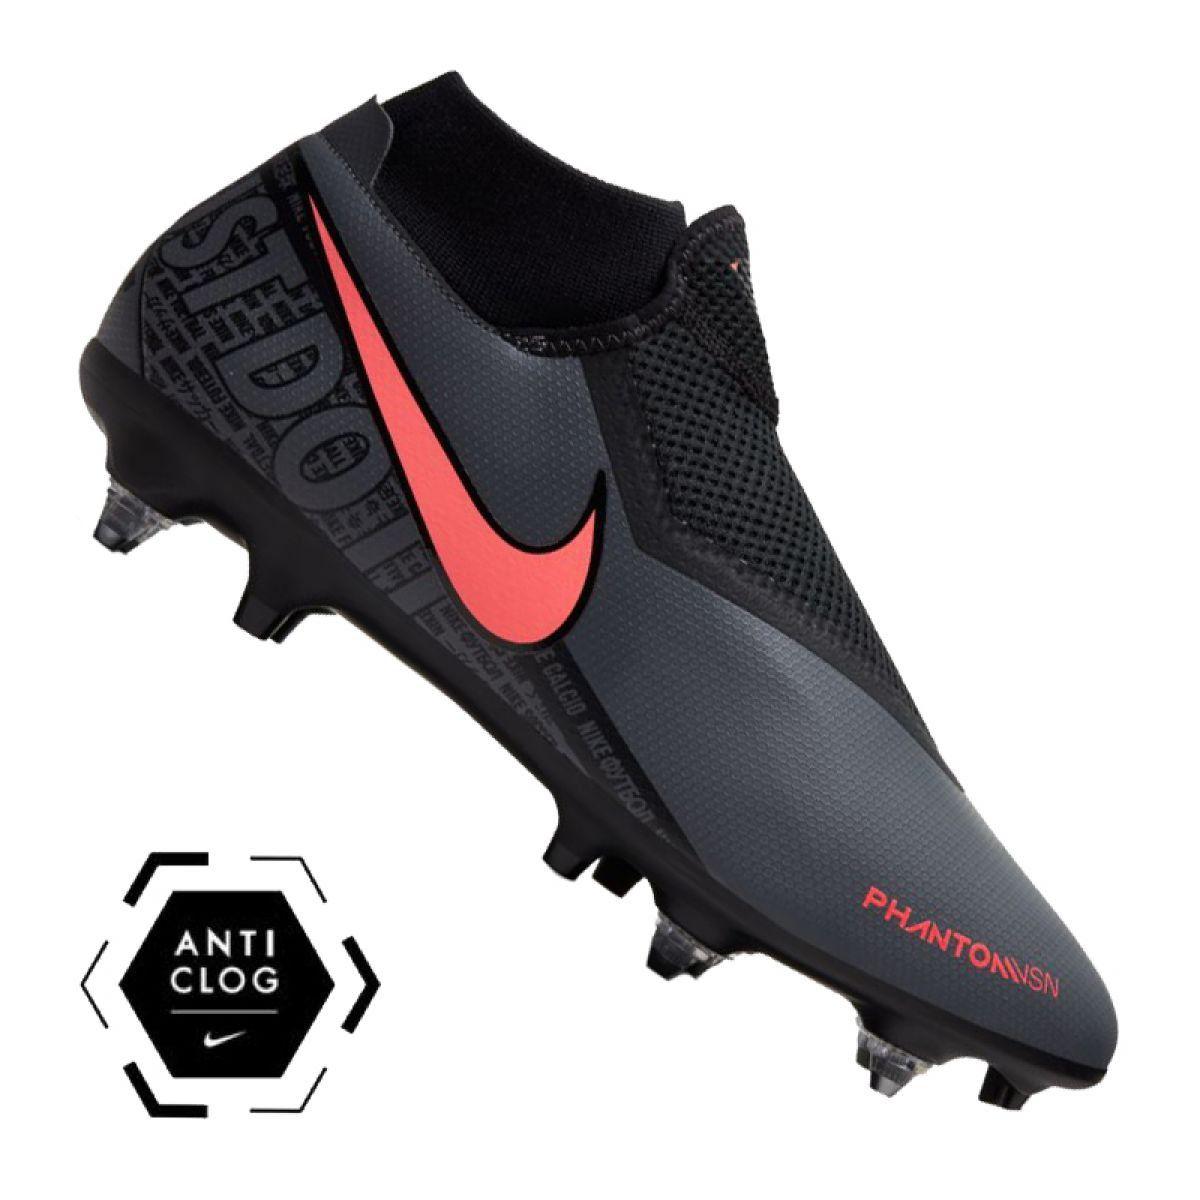 Corks Football Sport Nike Nike Phantom Vsn Academy Df Sg Pro Ac M Bq8845 080 Football Shoes Black Chuteiras